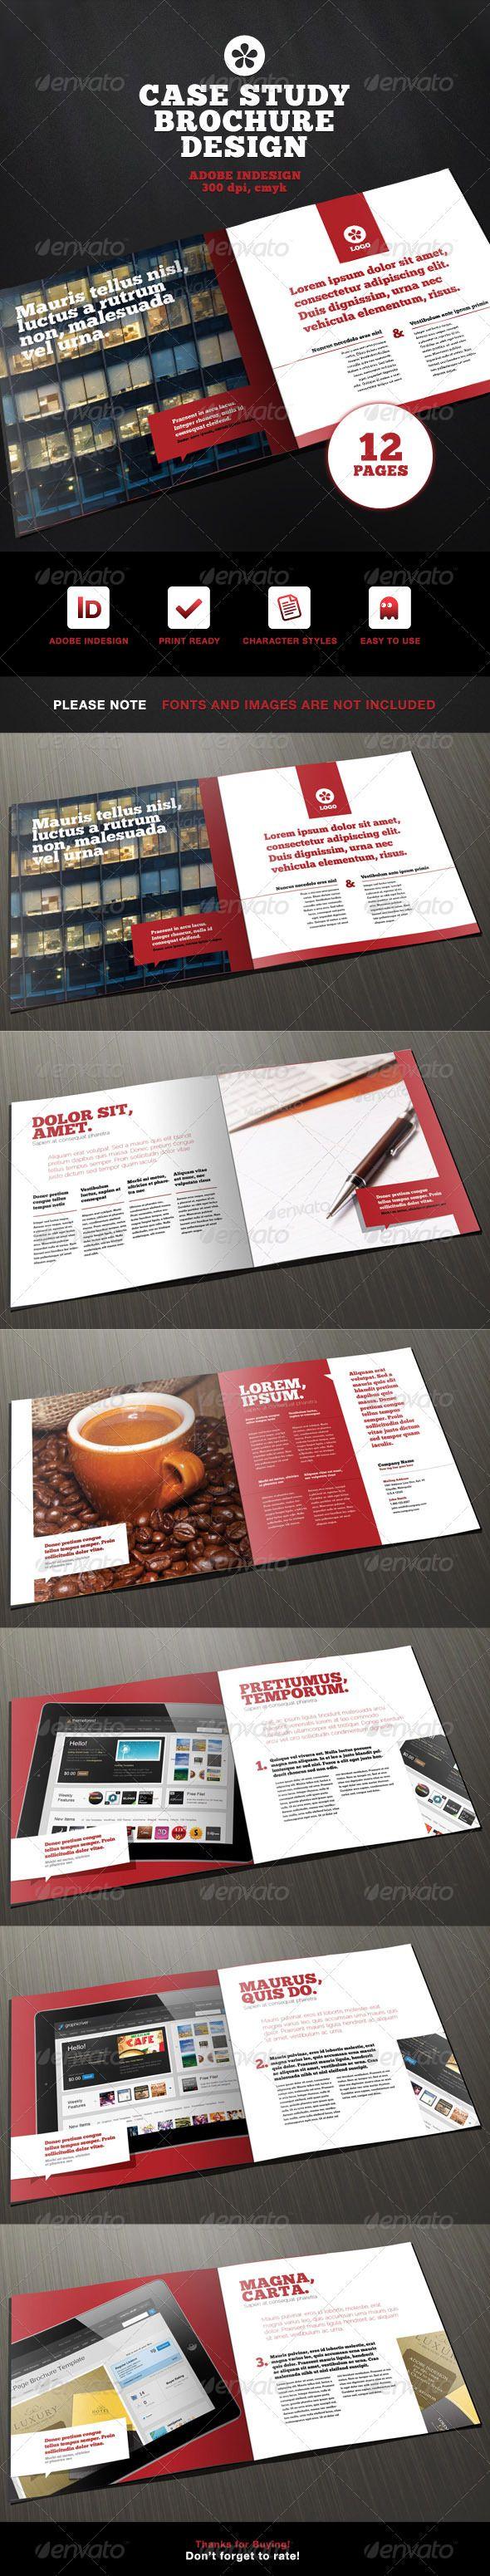 write objective resume internship Prophetik Soul Branding   Design